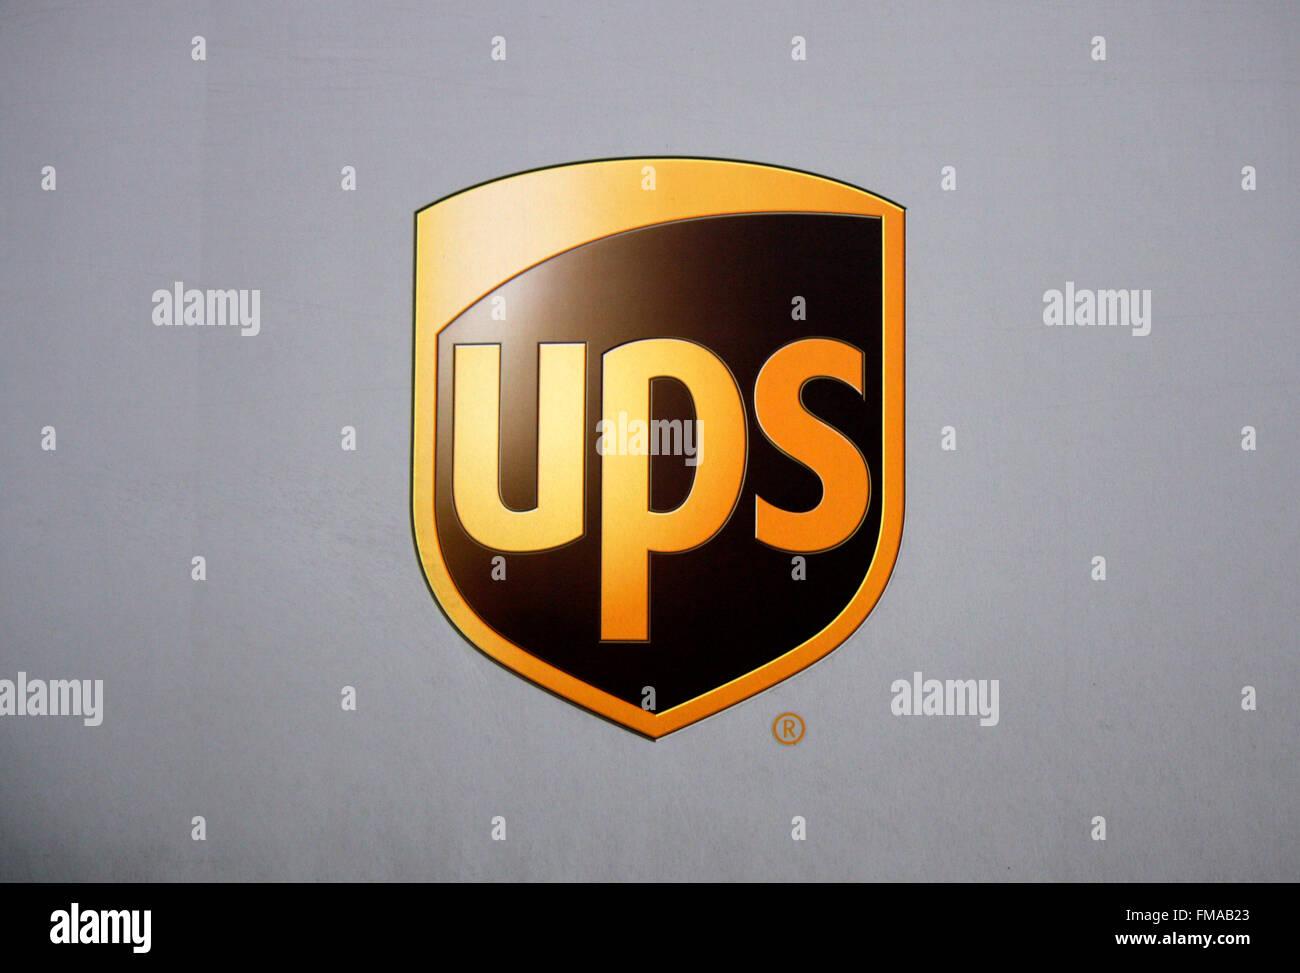 "Markenname: ""UPS - United Parcel Service', Dezember 2013, Berlino. Immagini Stock"